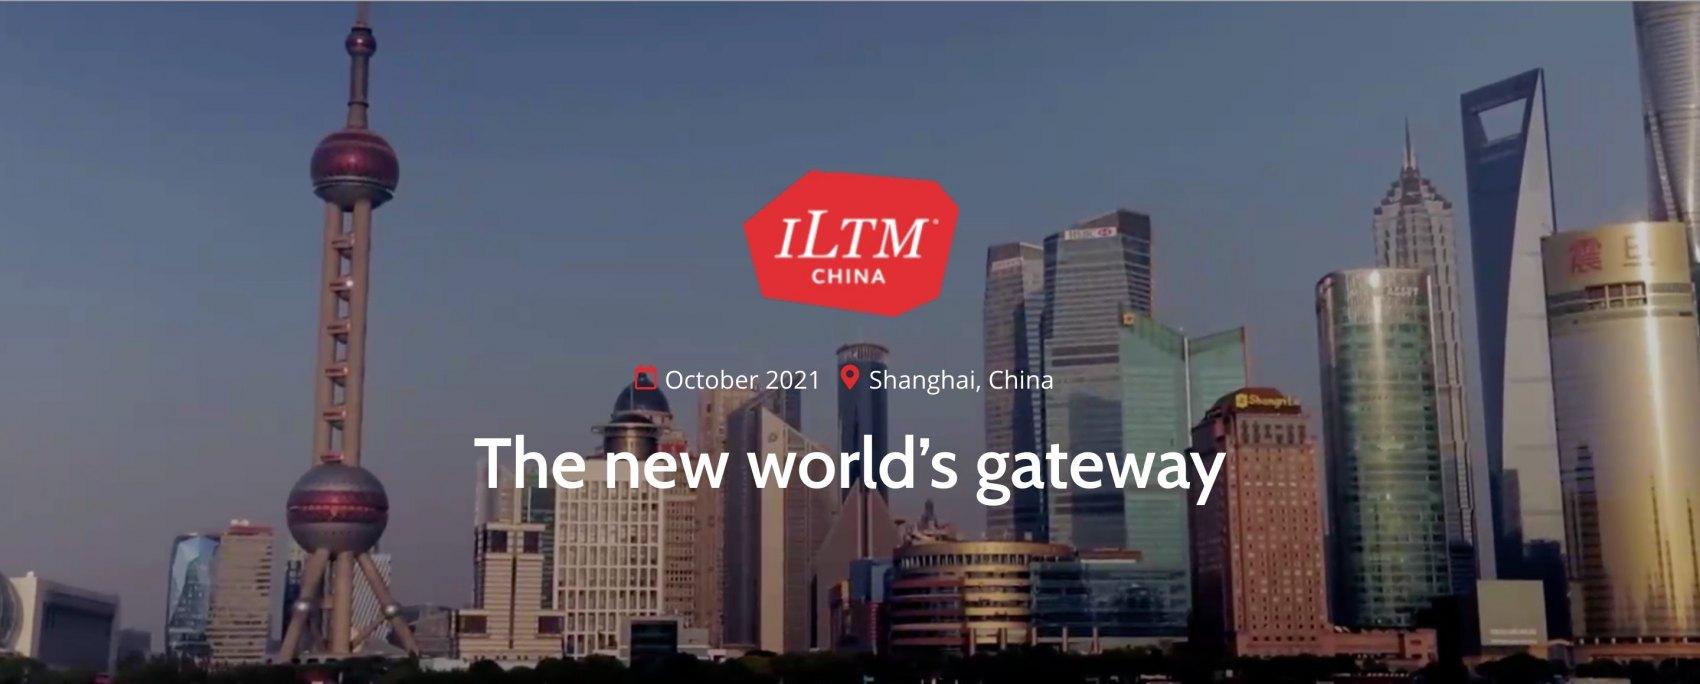 ILTM China Conference